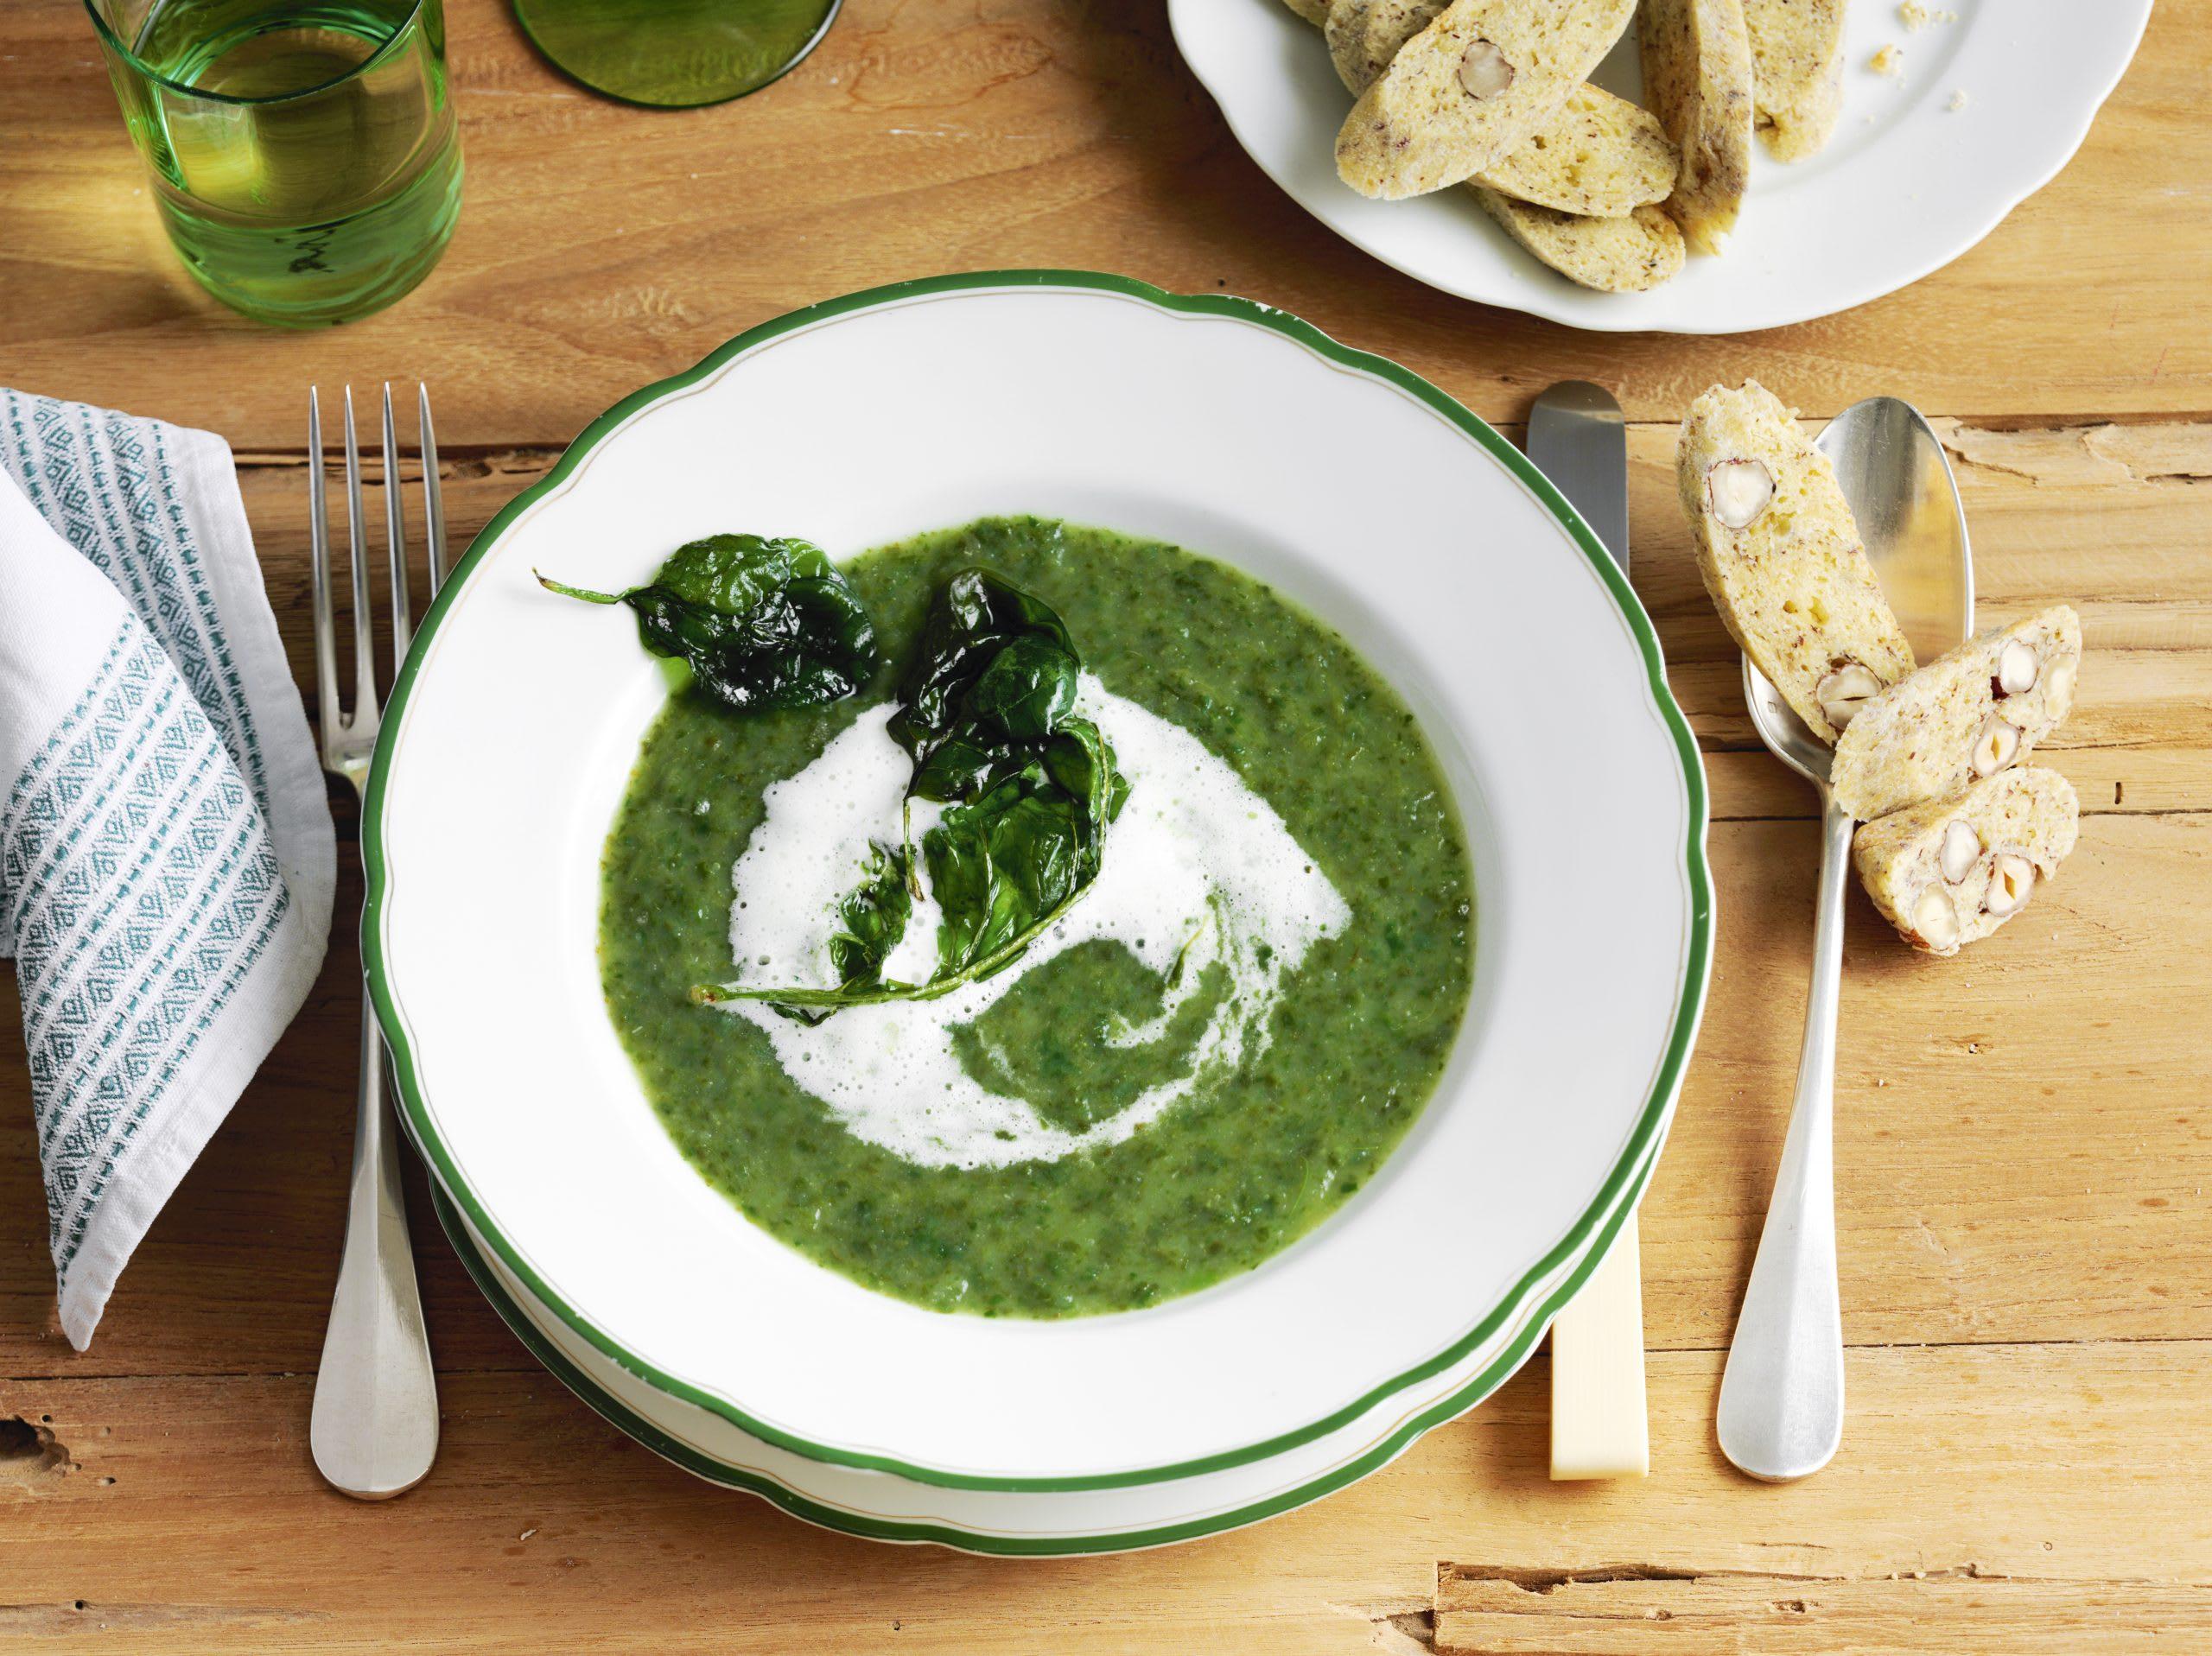 Kohlrabi-Spinat-Suppe und Emmentaler Chrömli